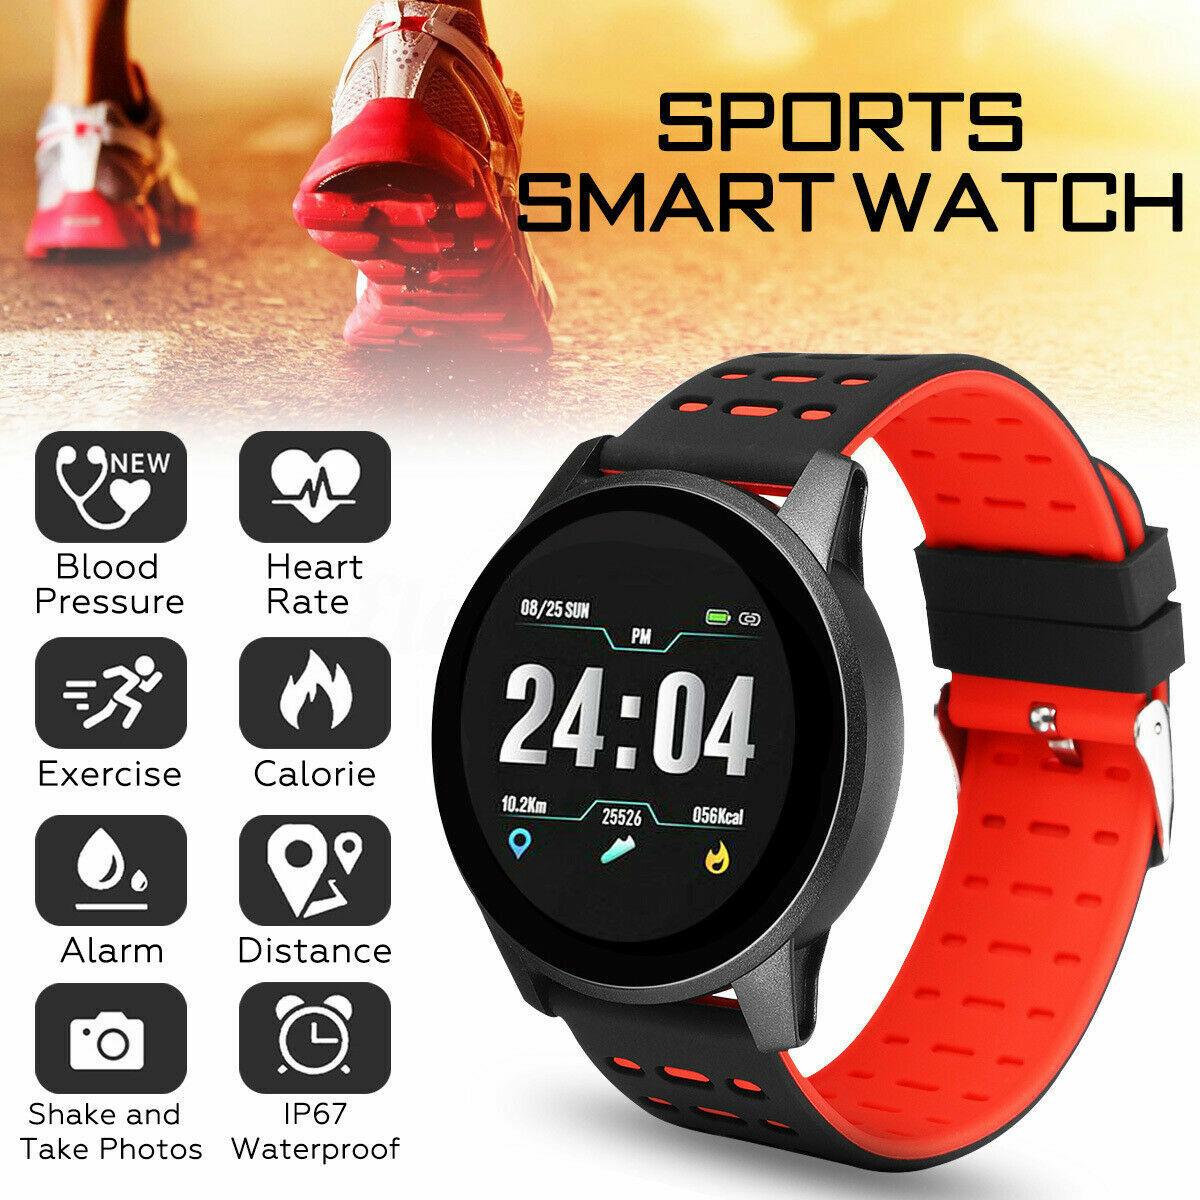 Bluetooth Sport Smart Watch Fitness Tracker Step Counter Ped